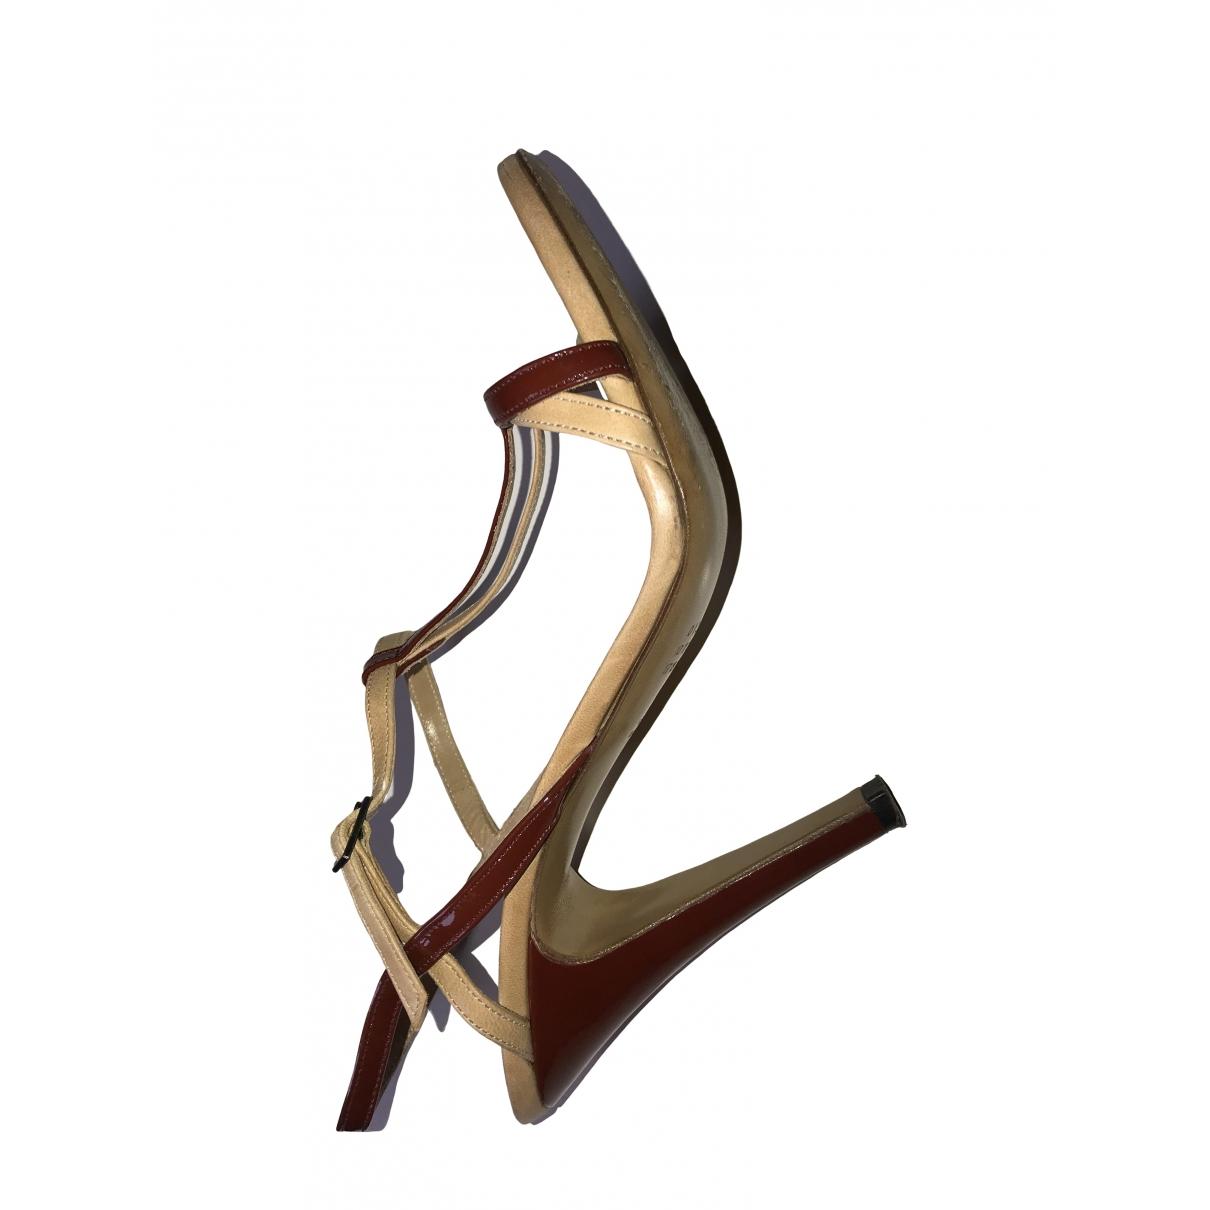 Sandalias de Cuero Maison Martin Margiela